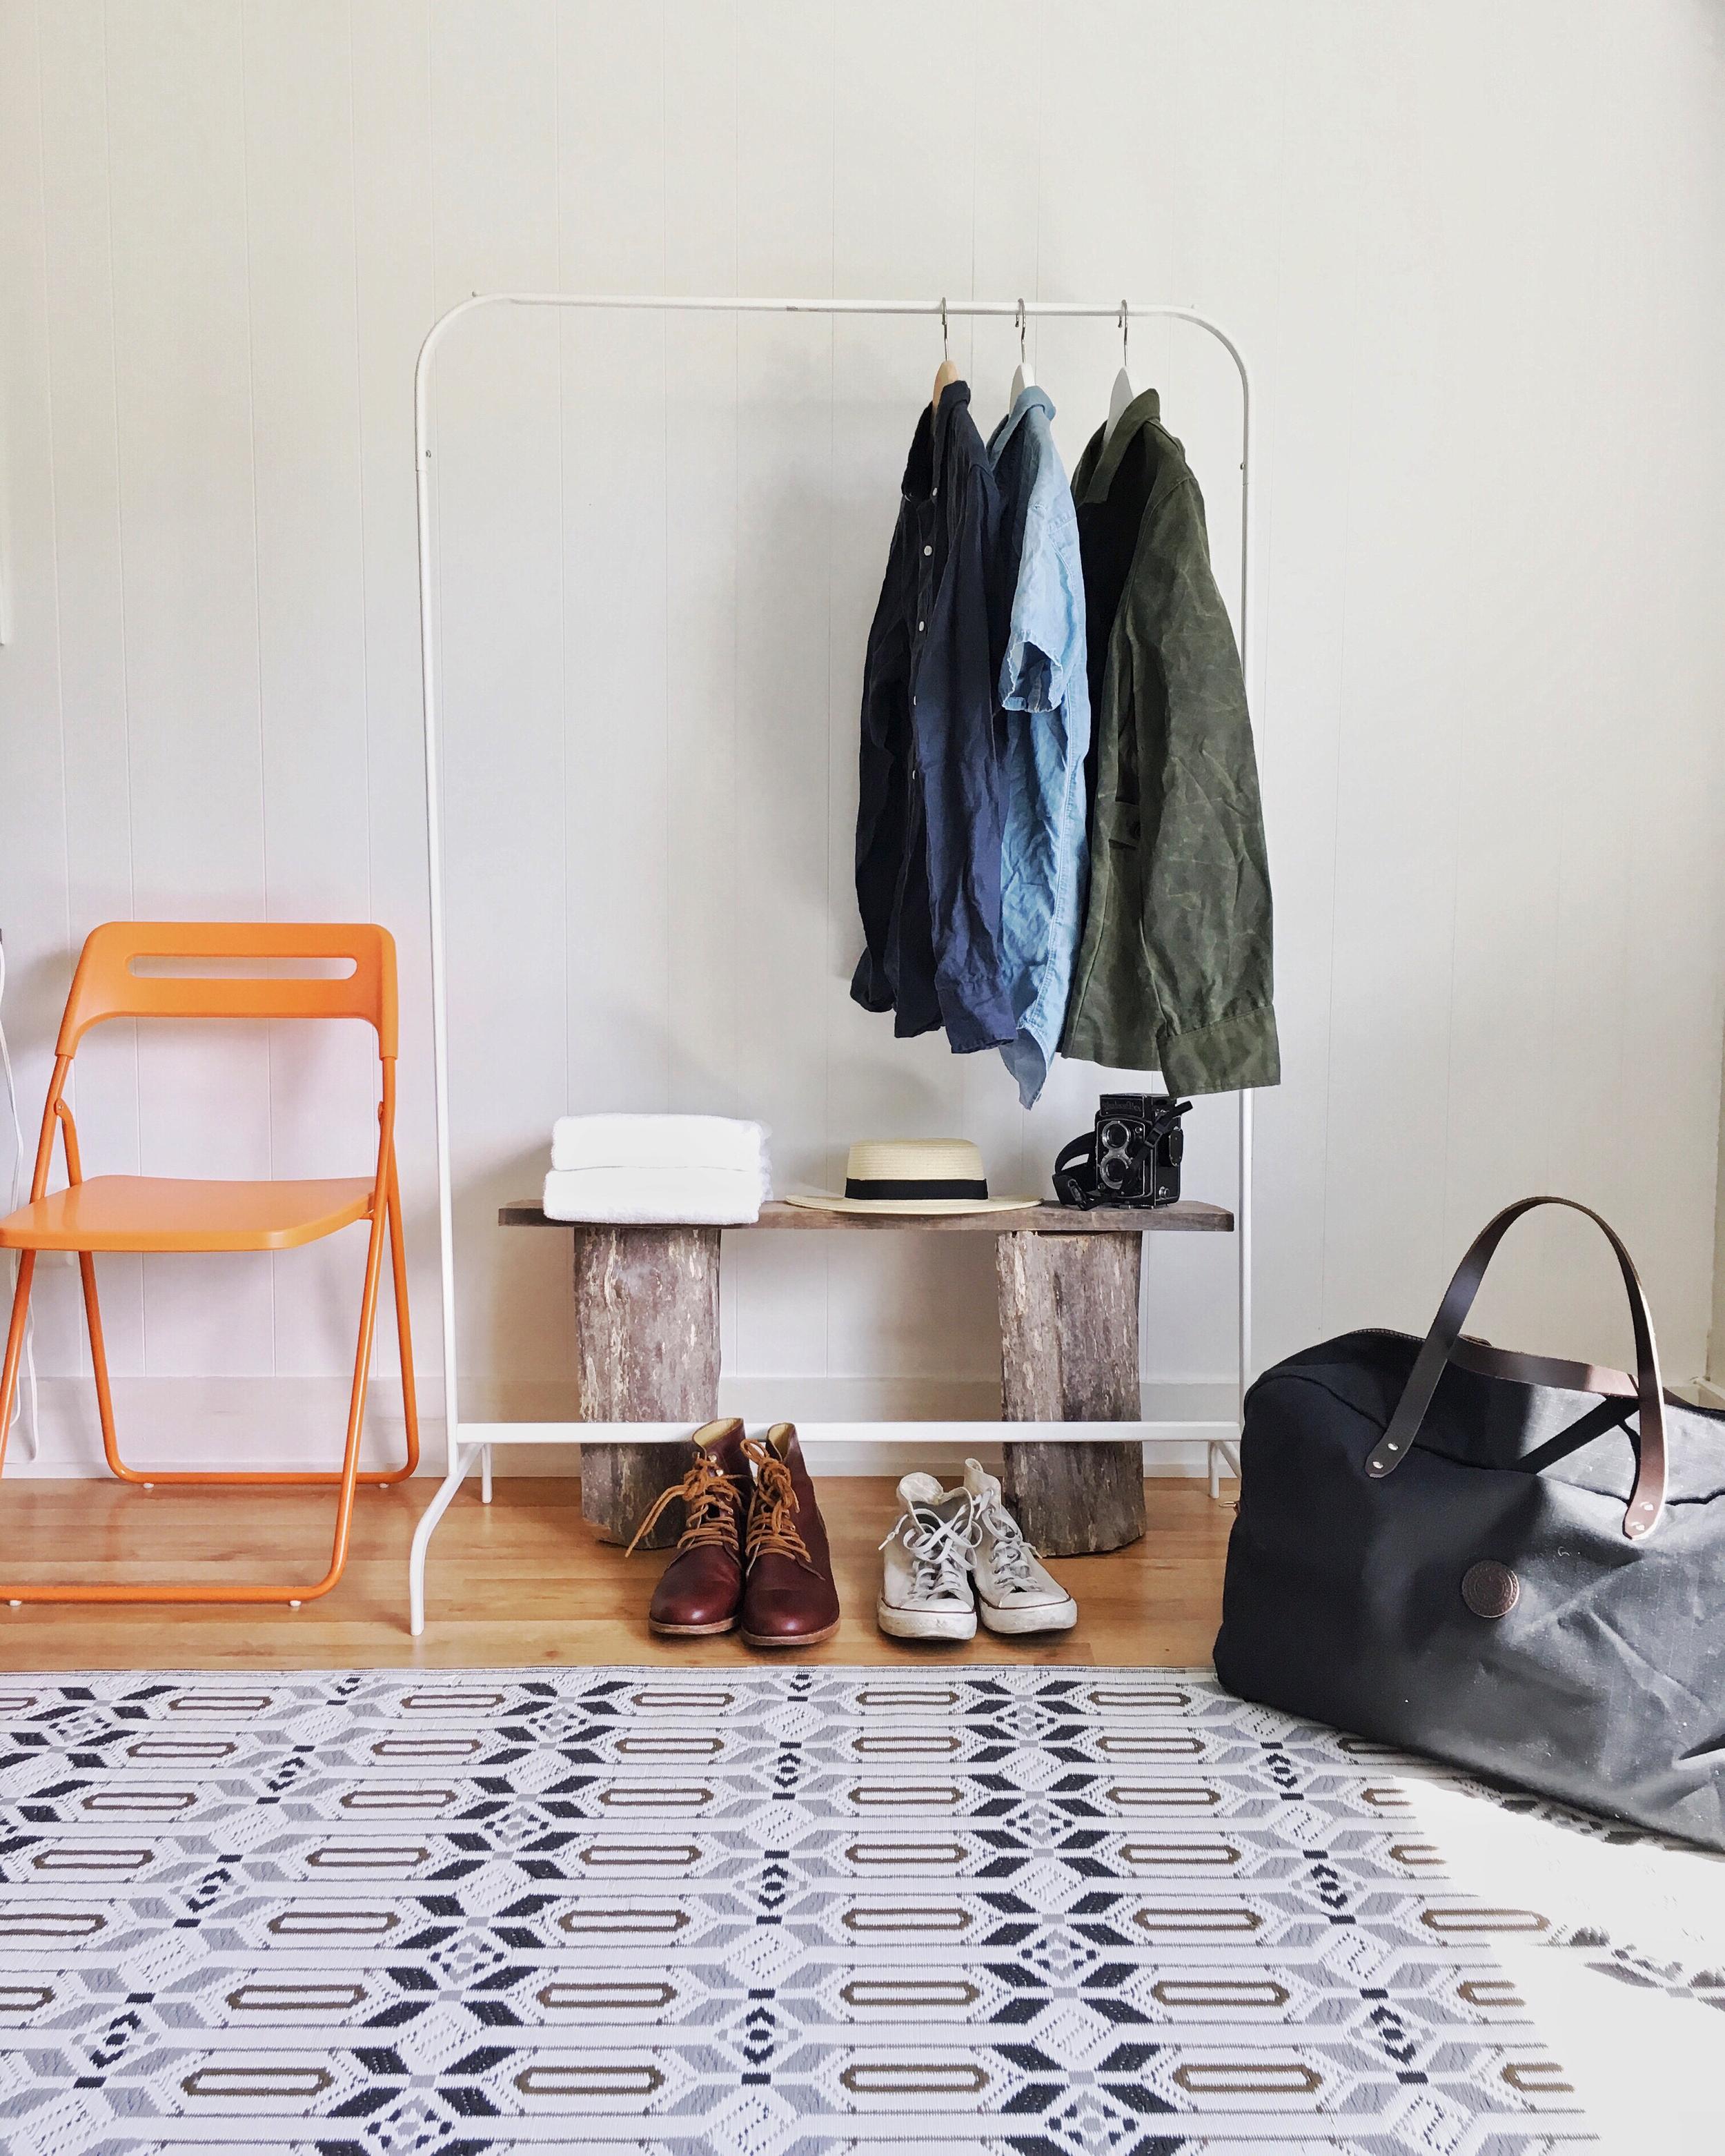 spruceton_inn_clothes_rack